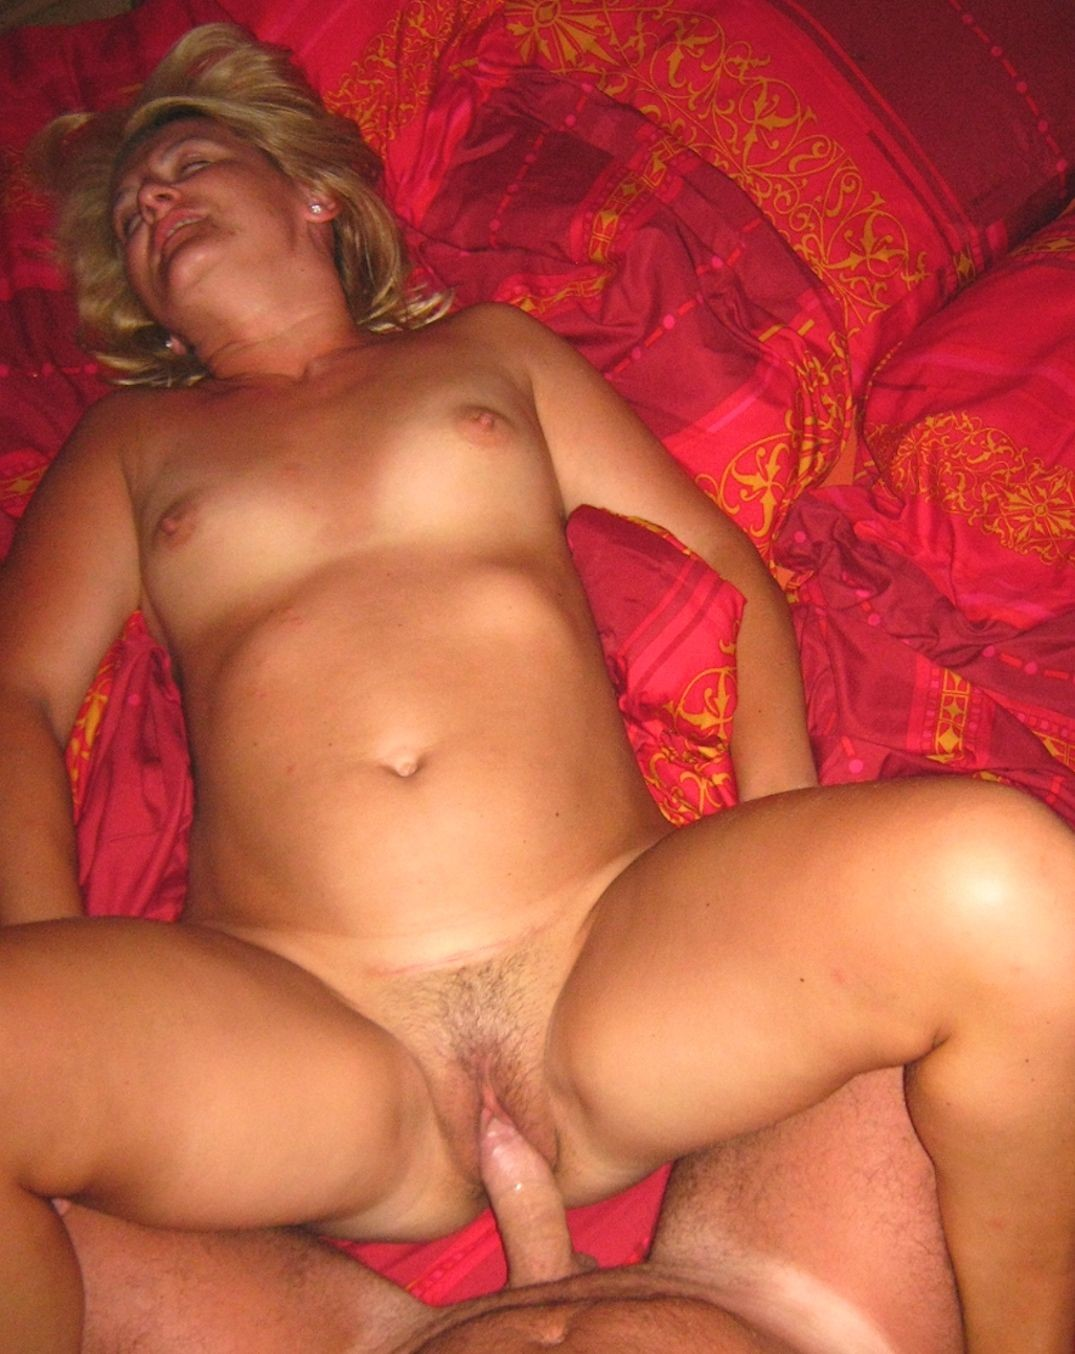 Просто фото домашнего секса - компиляция 3